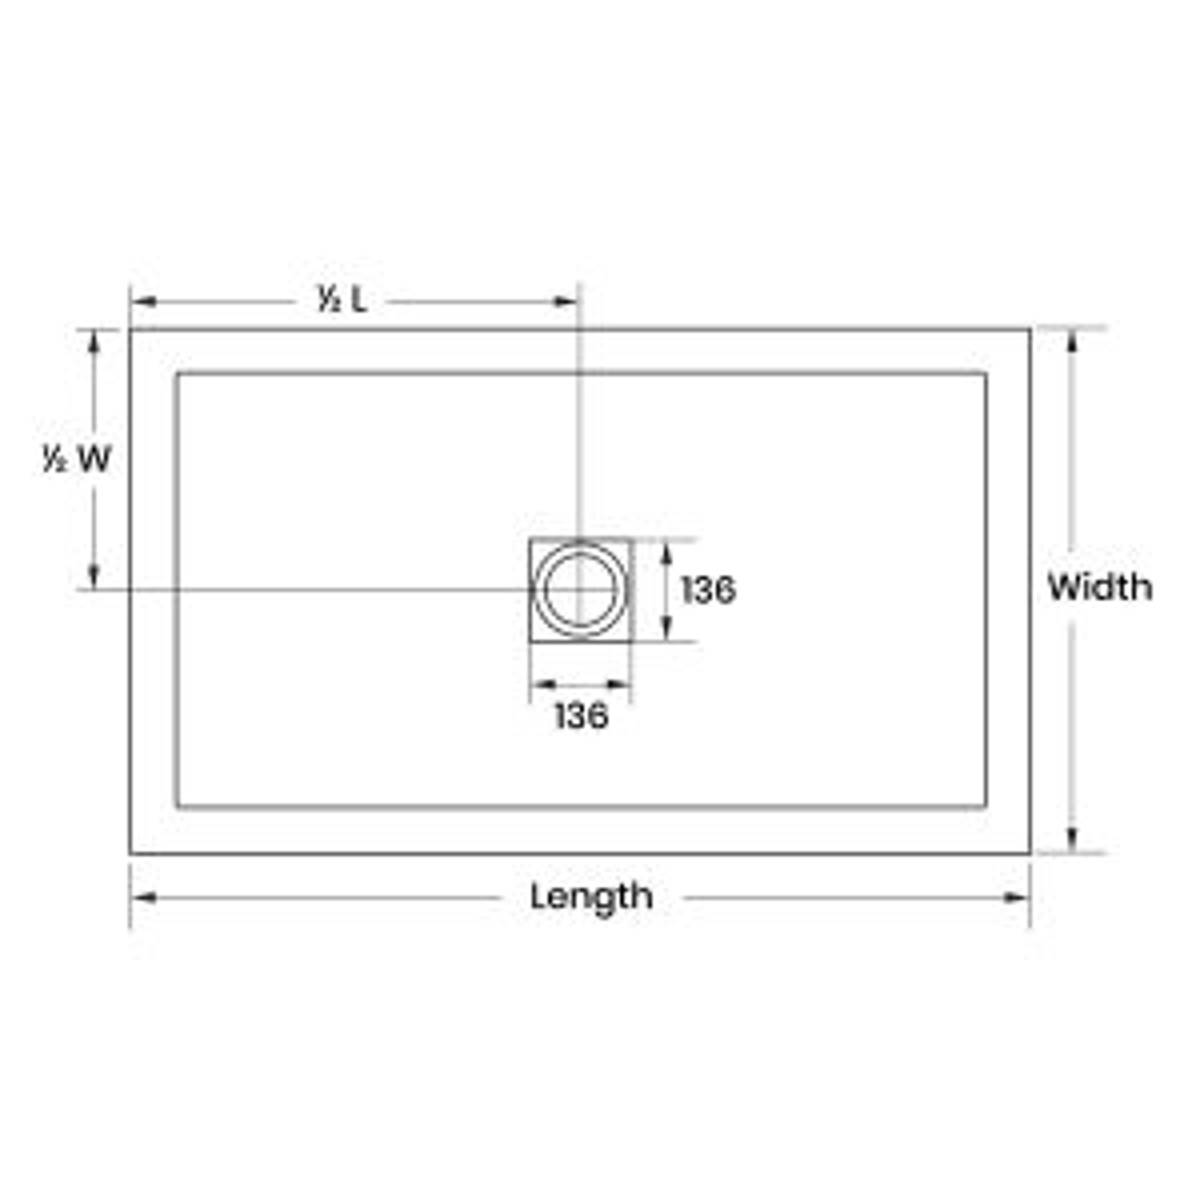 Aquadart White Slate Shower Tray 1200 x 900 Dimension